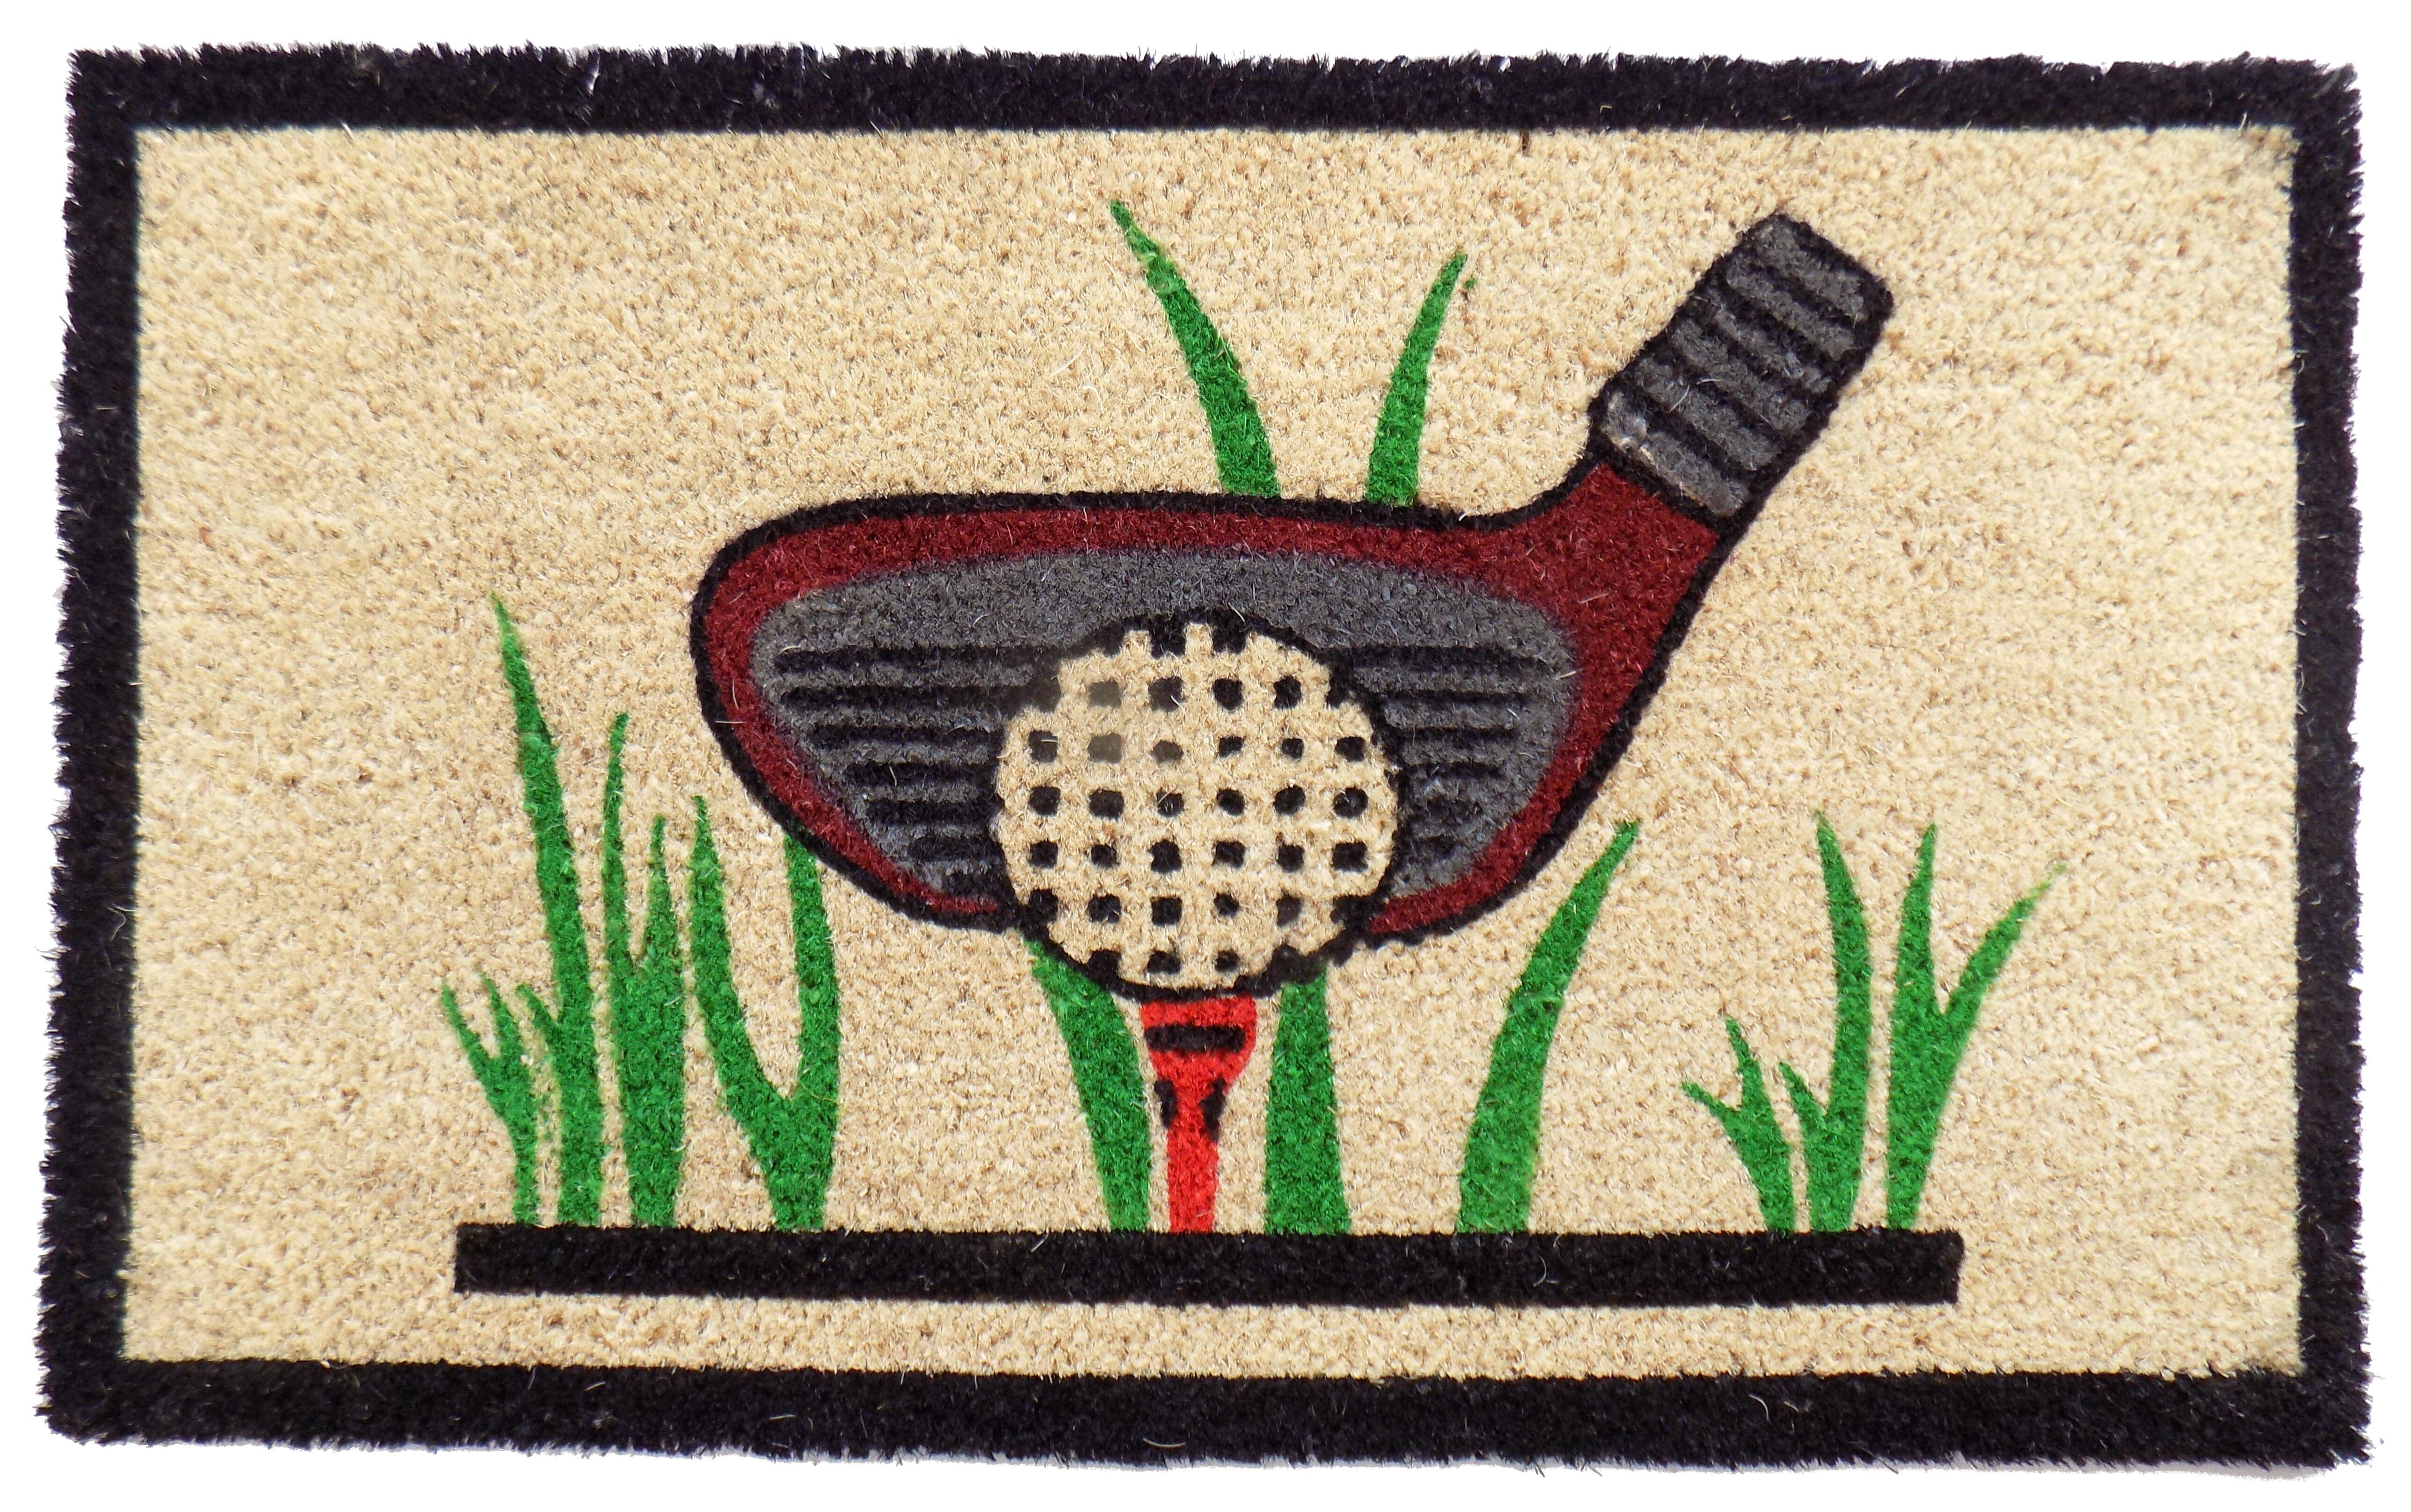 Genial Imports Decor Phillip Golf Doormat U0026 Reviews | Wayfair